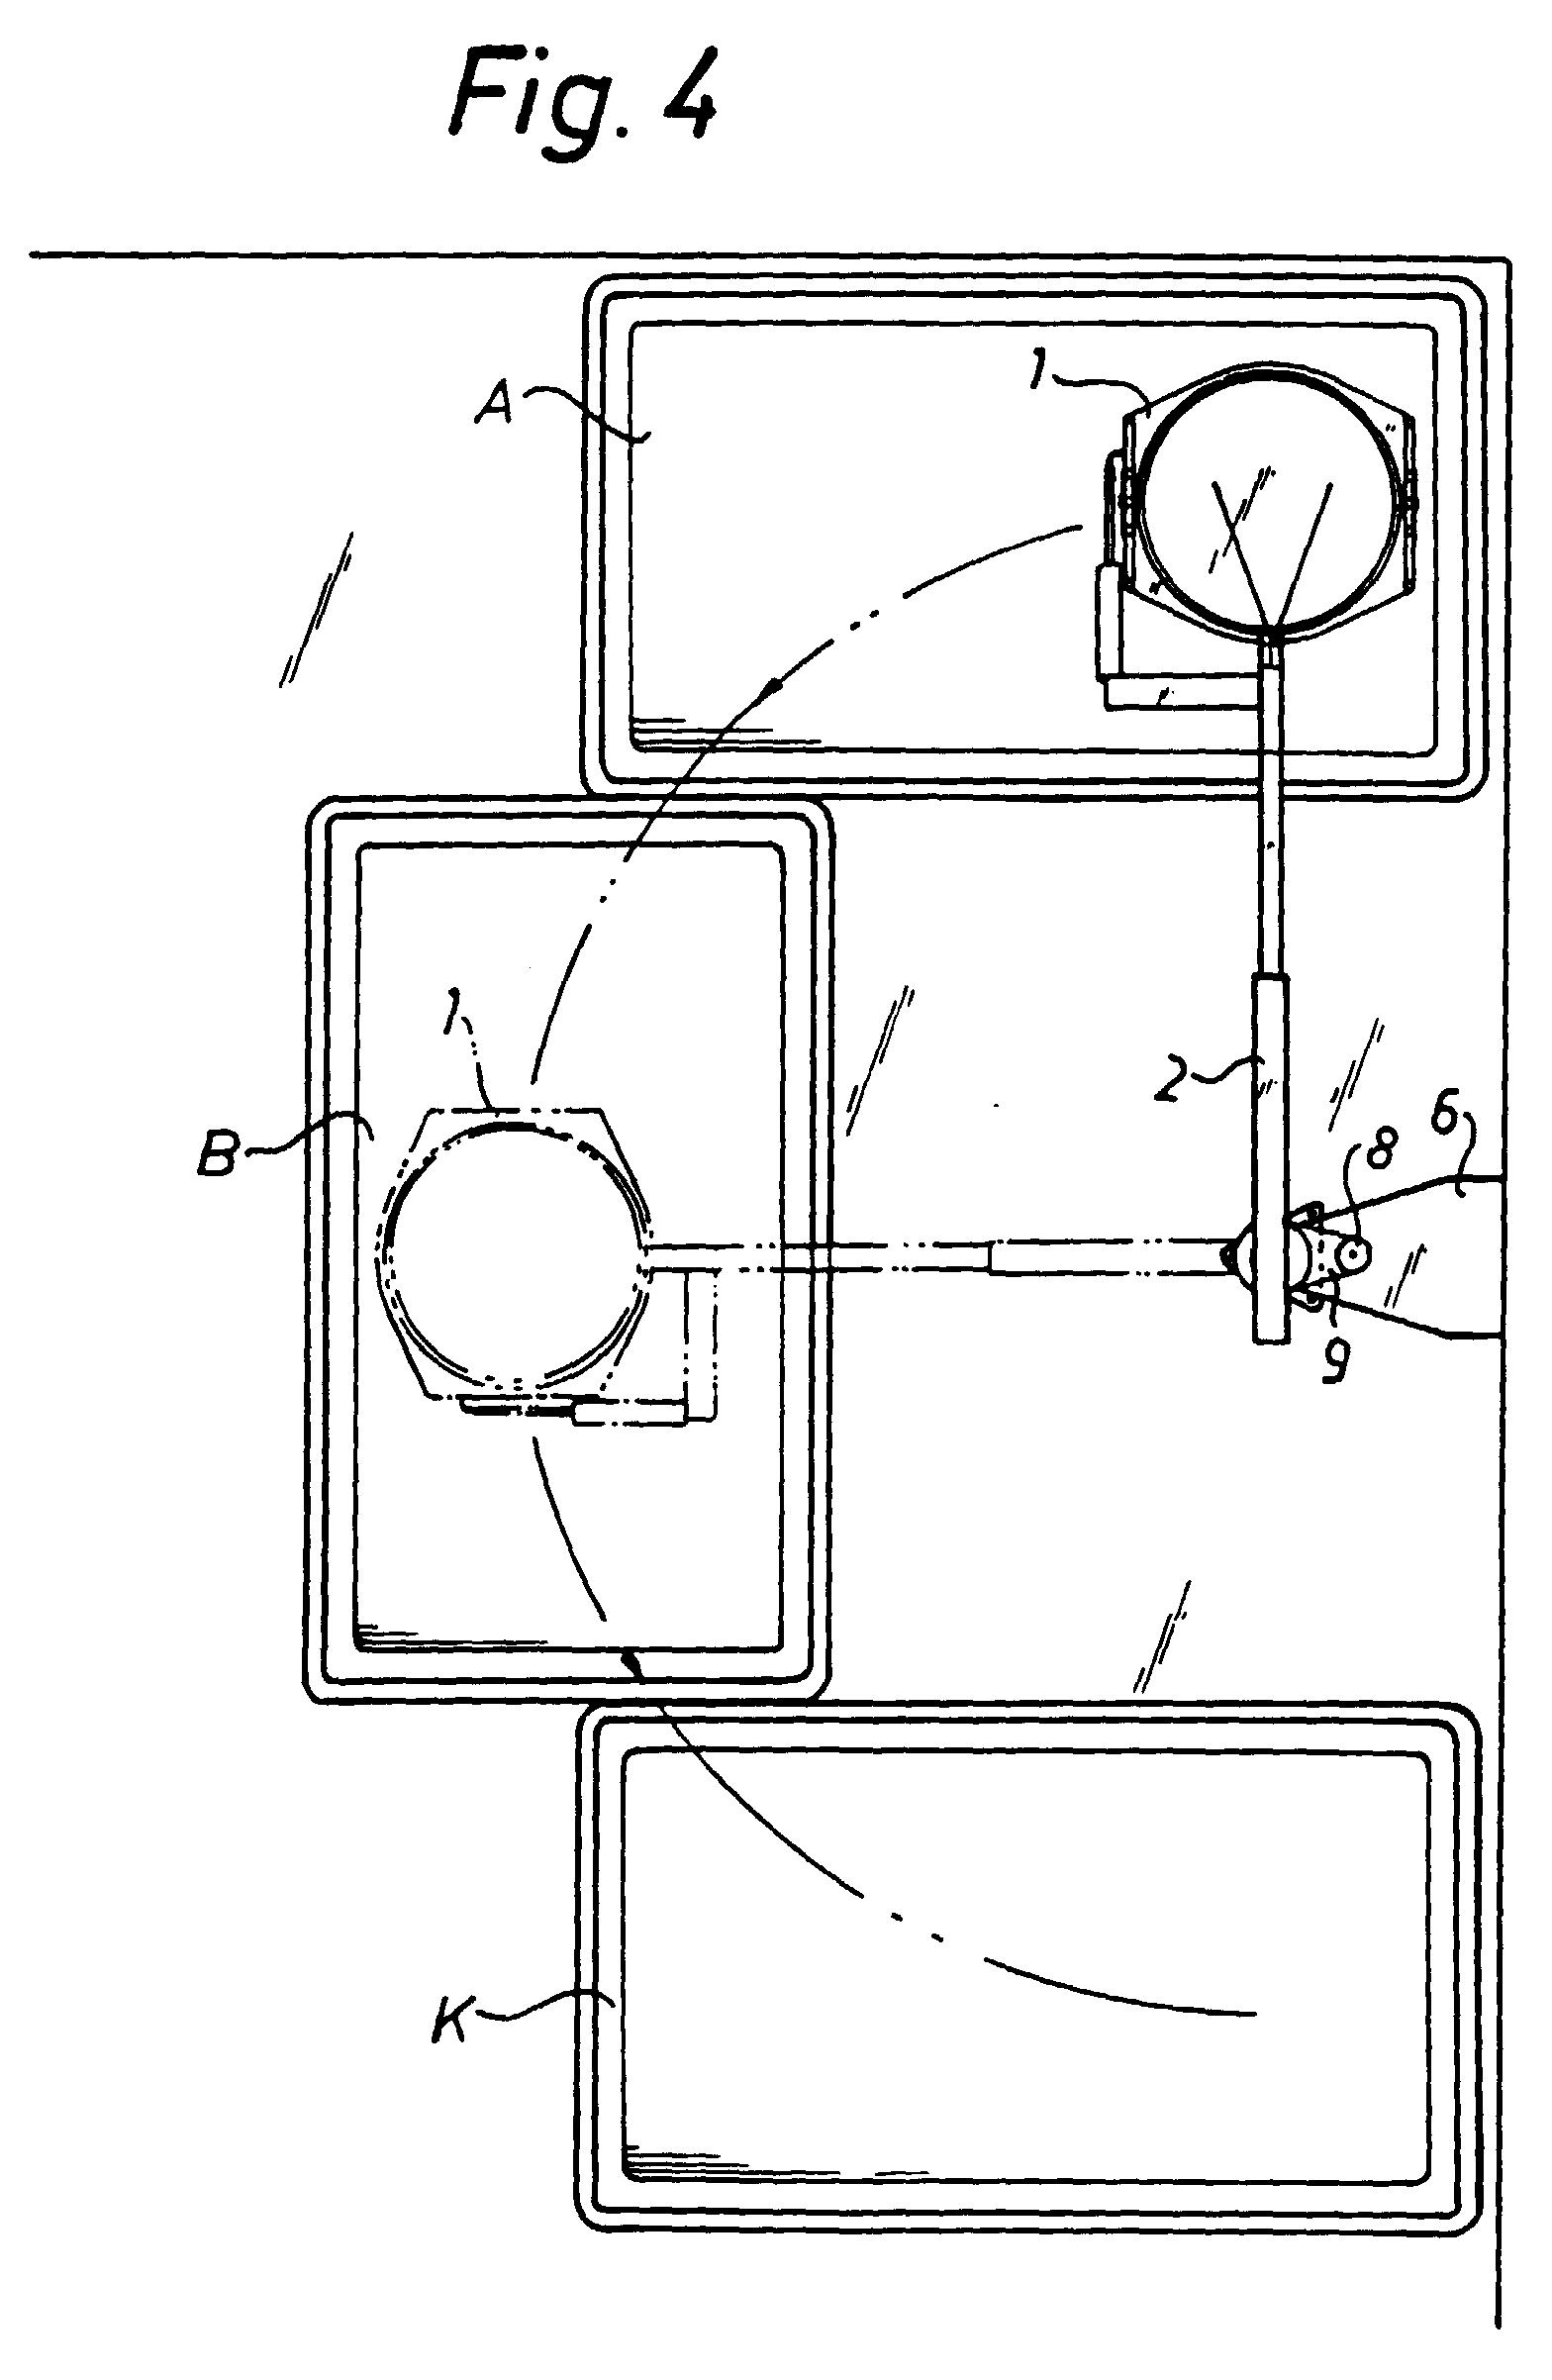 Trash Chute Dimensions : Patente ep b refuse sorting device for